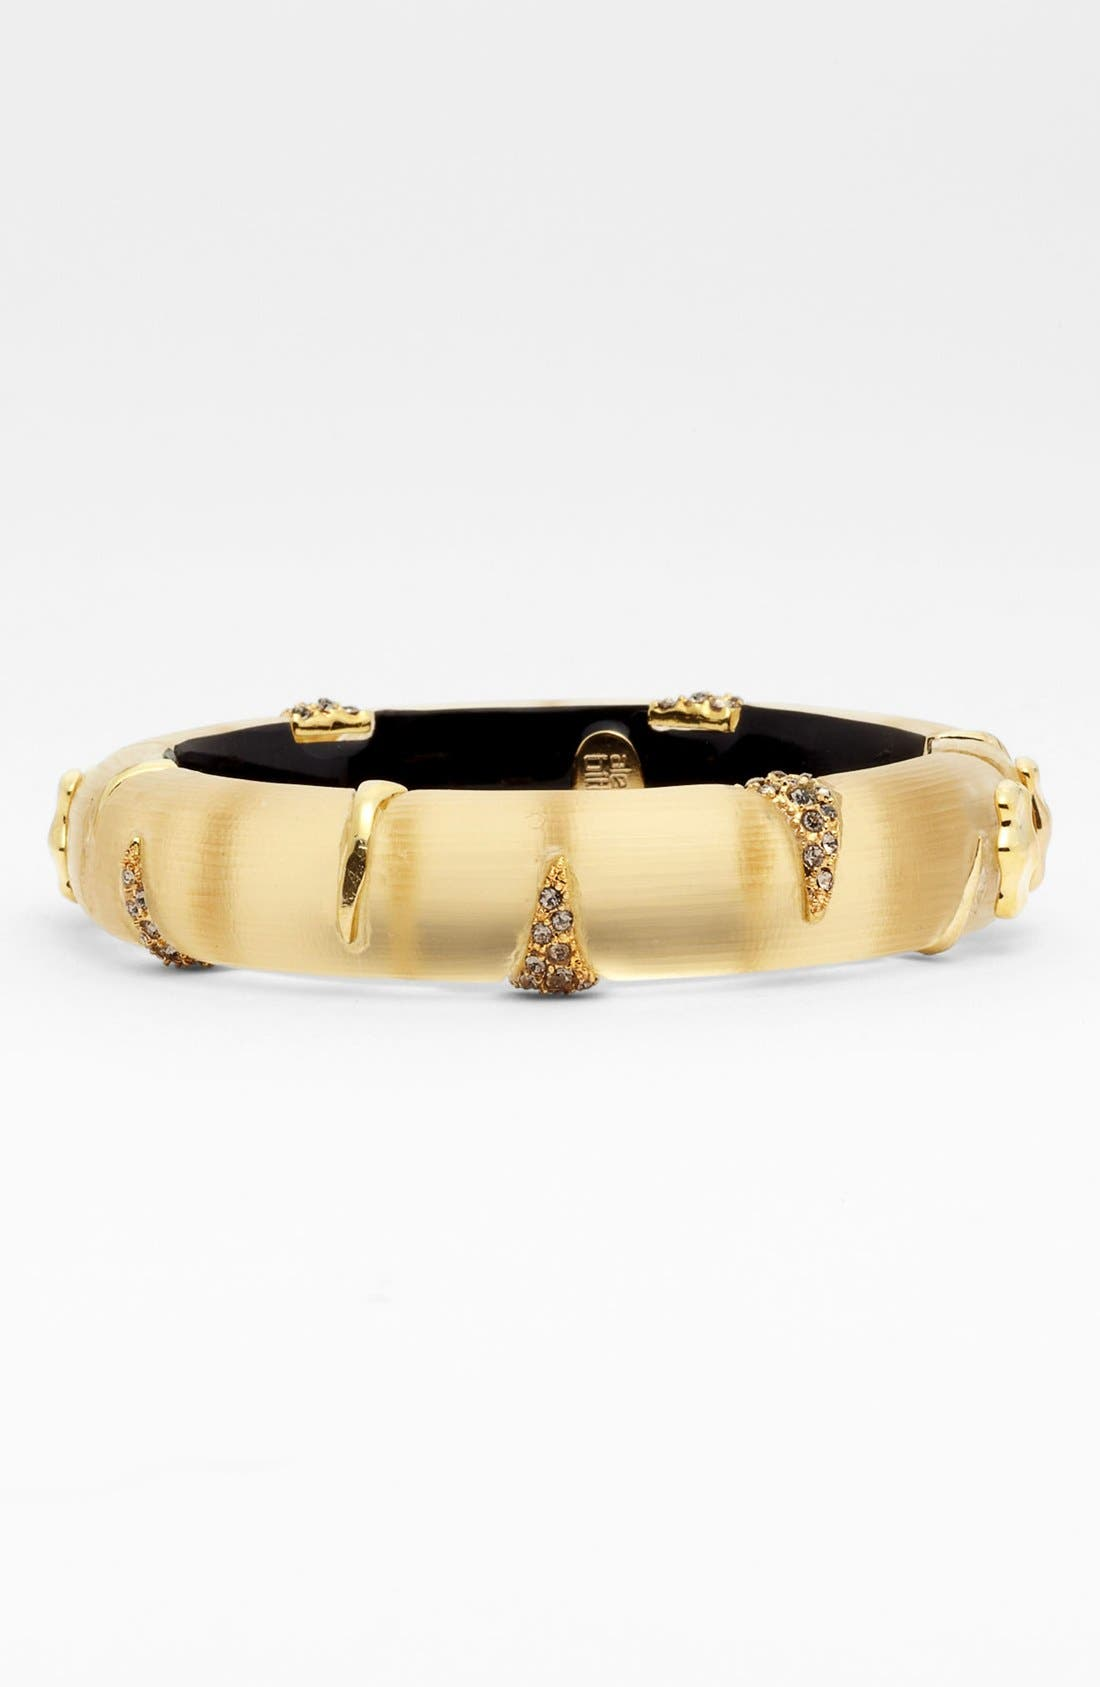 Alternate Image 1 Selected - Alexis Bittar 'Lucite® - Durban' Hinged Bracelet